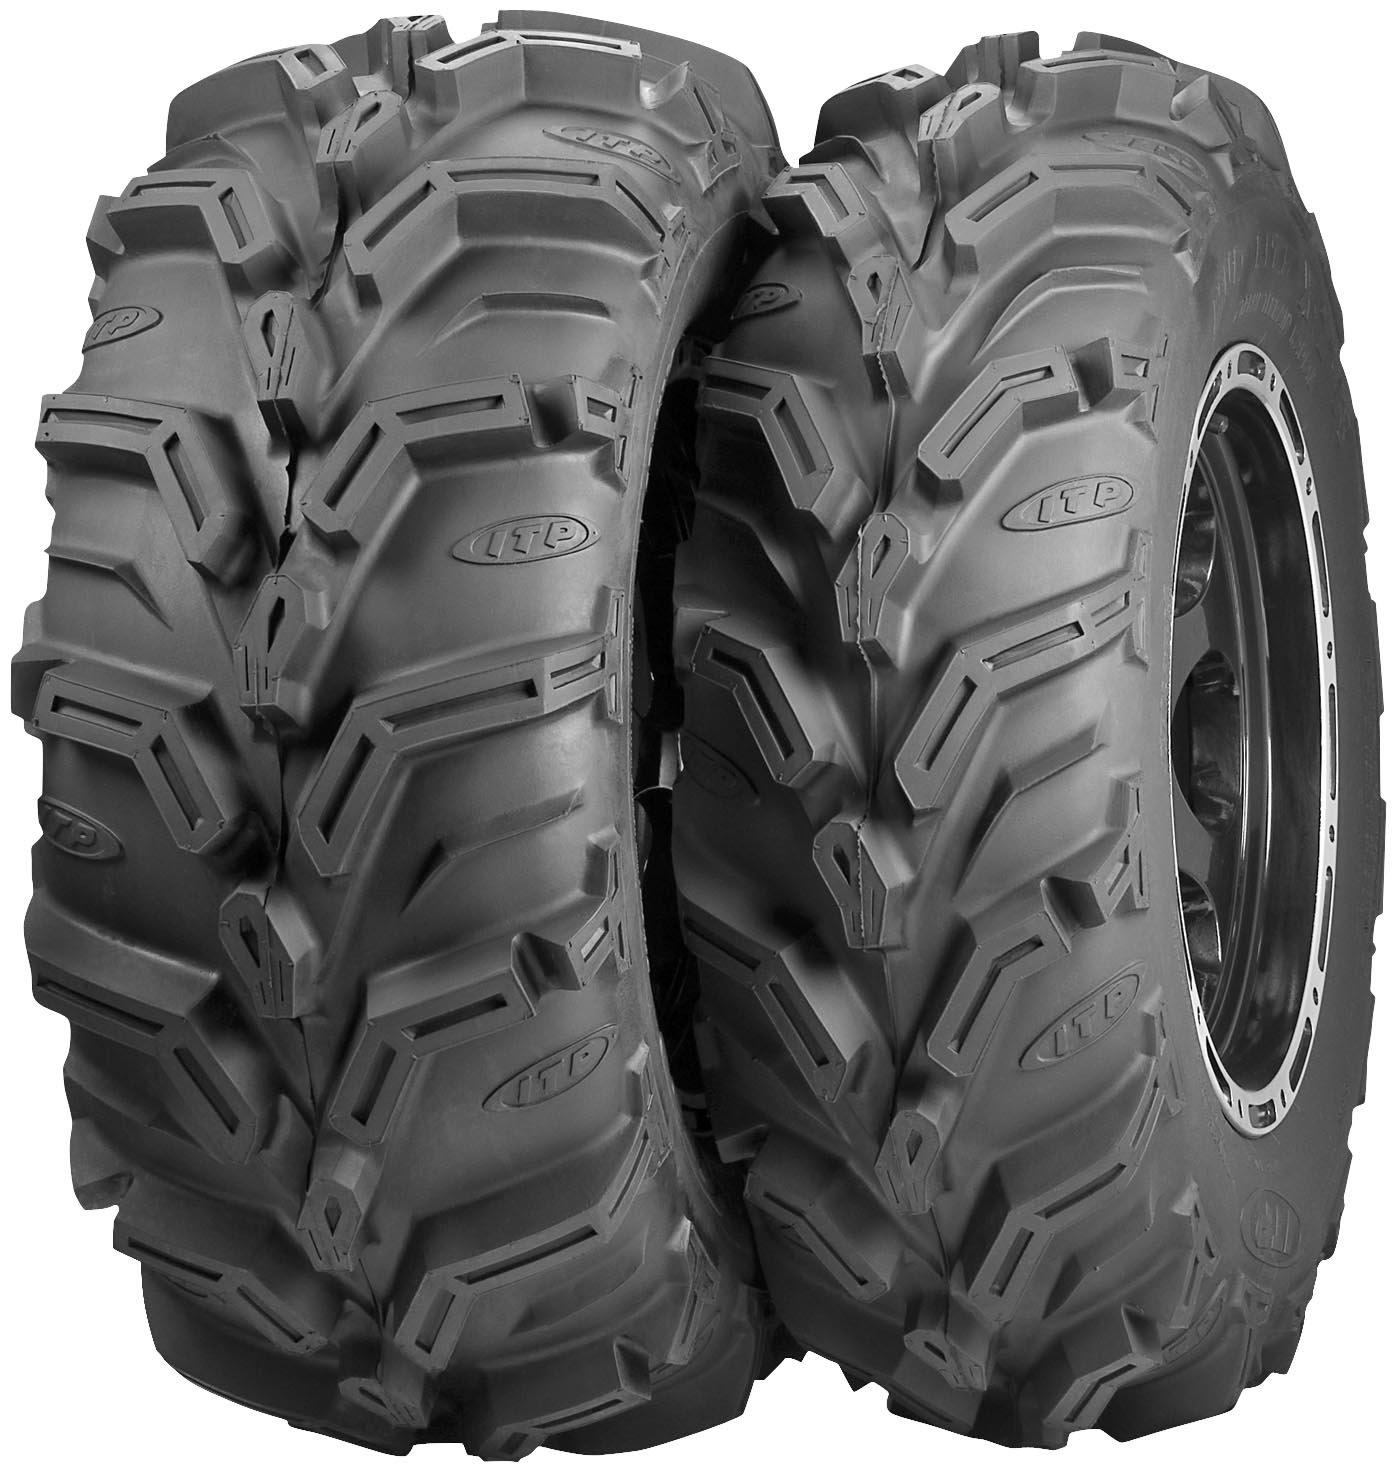 ITP Mudlite XTR 6 Ply 27-9R14 Radial ATV Tire